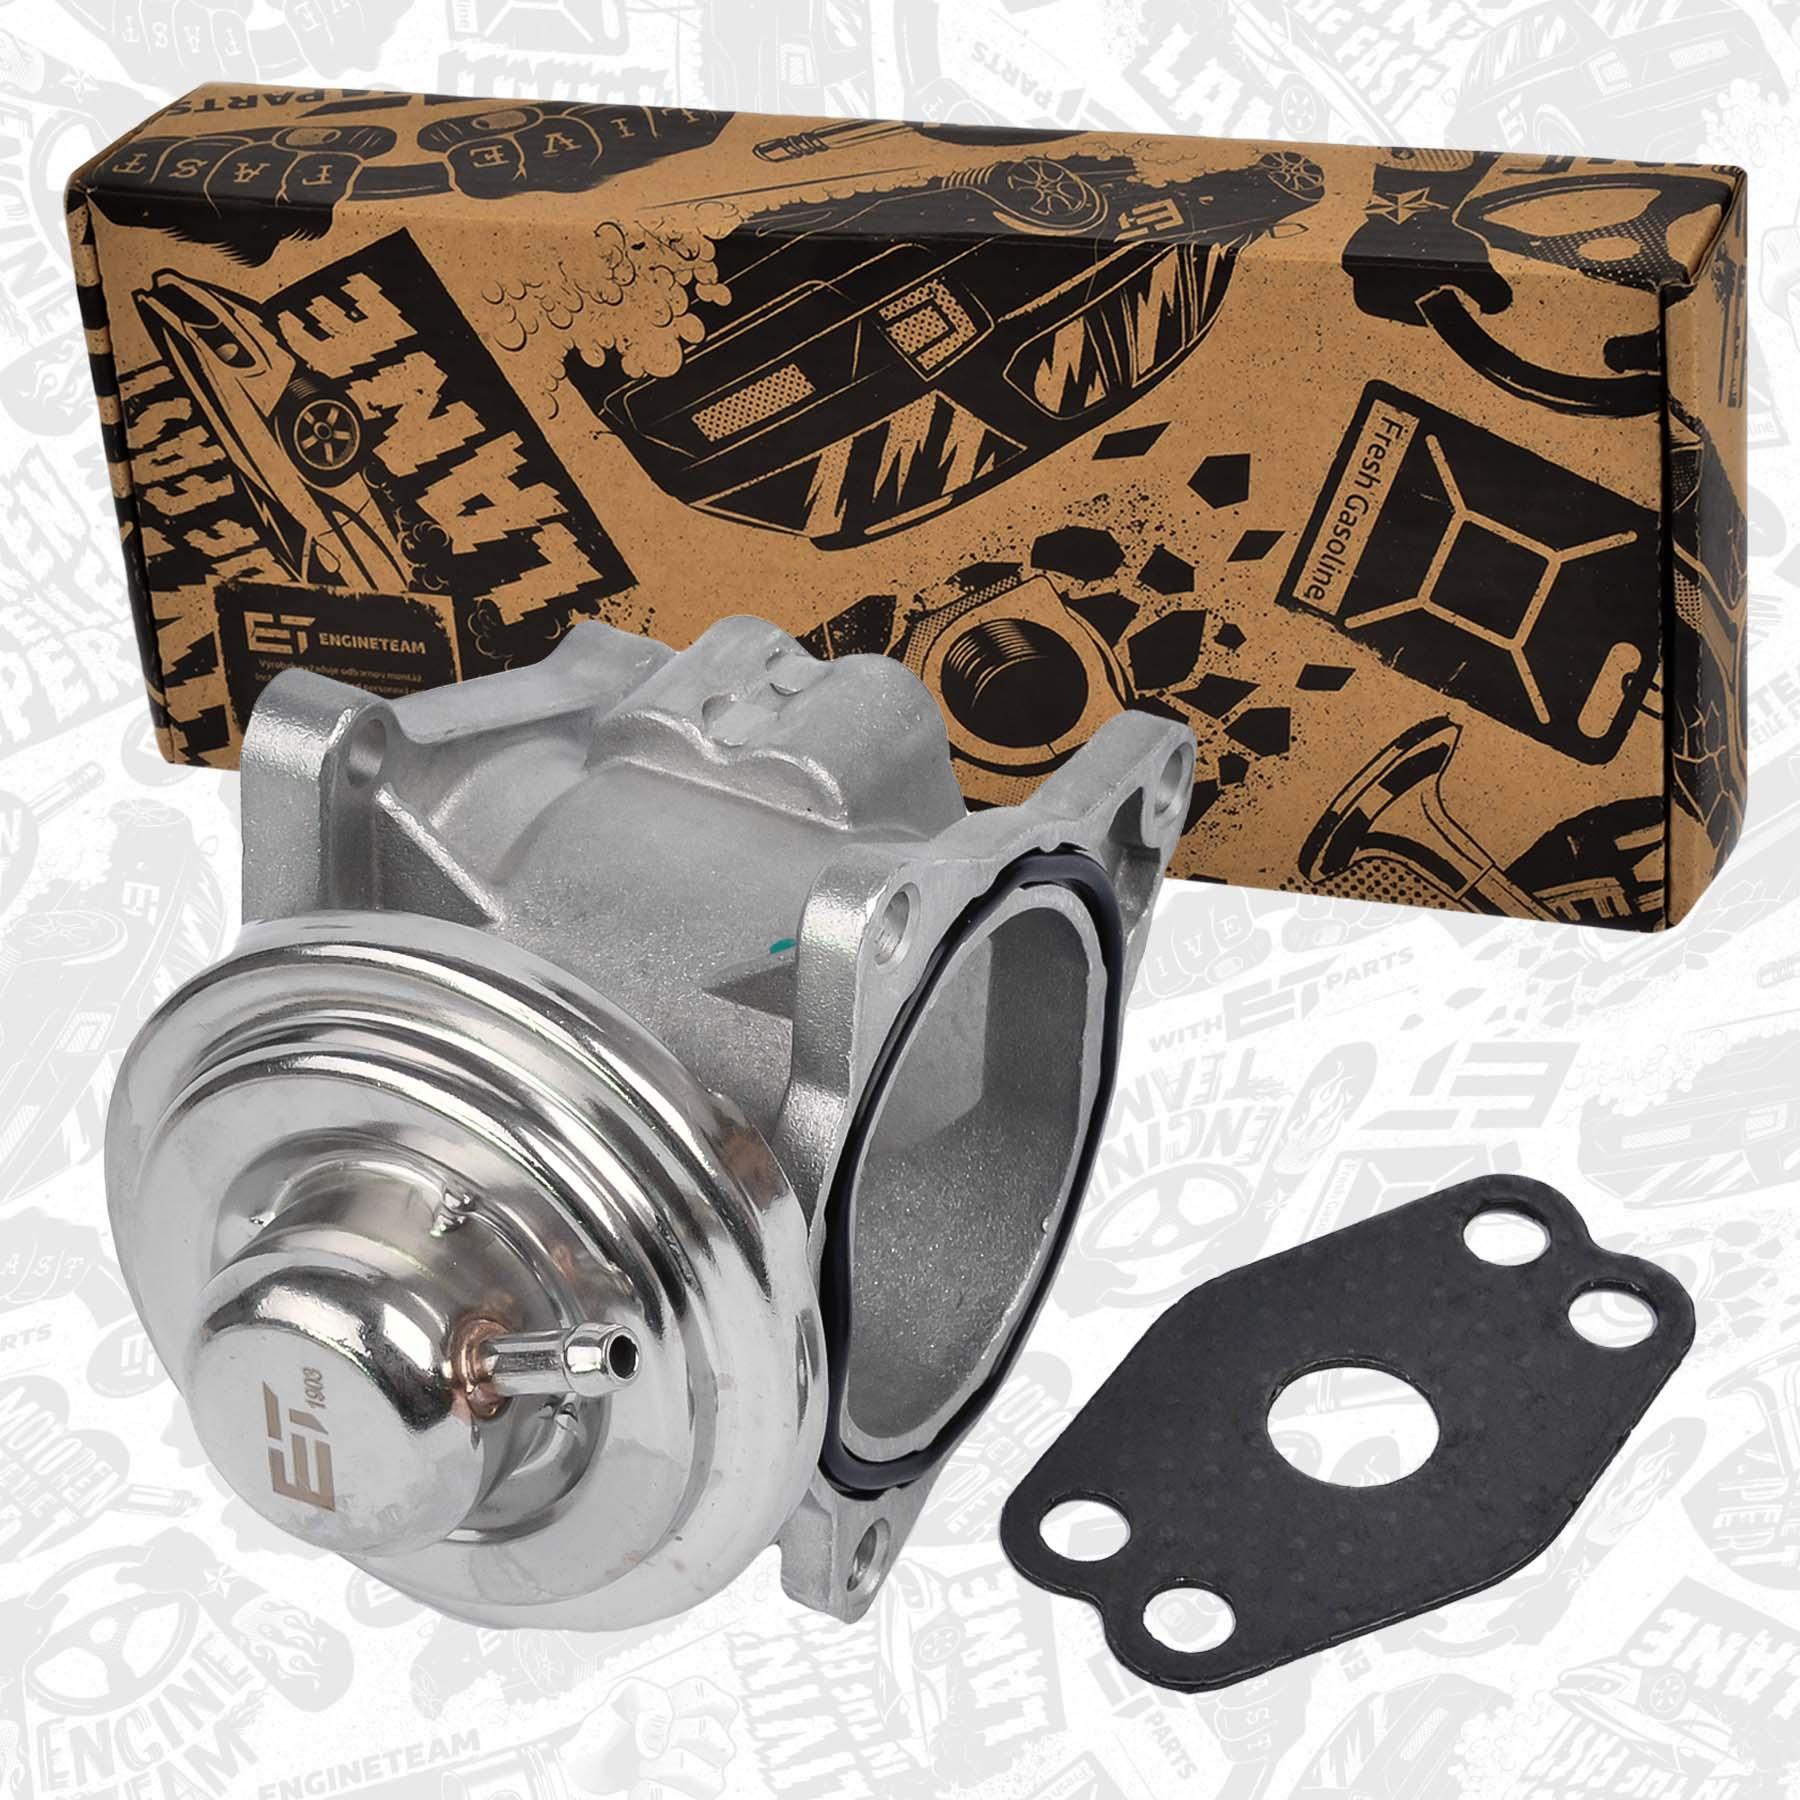 NEU AGR-VENTIL MIT DICHTUNG 038131501AN 038131501AF für AUDI VW 1.9 2.0 TDI